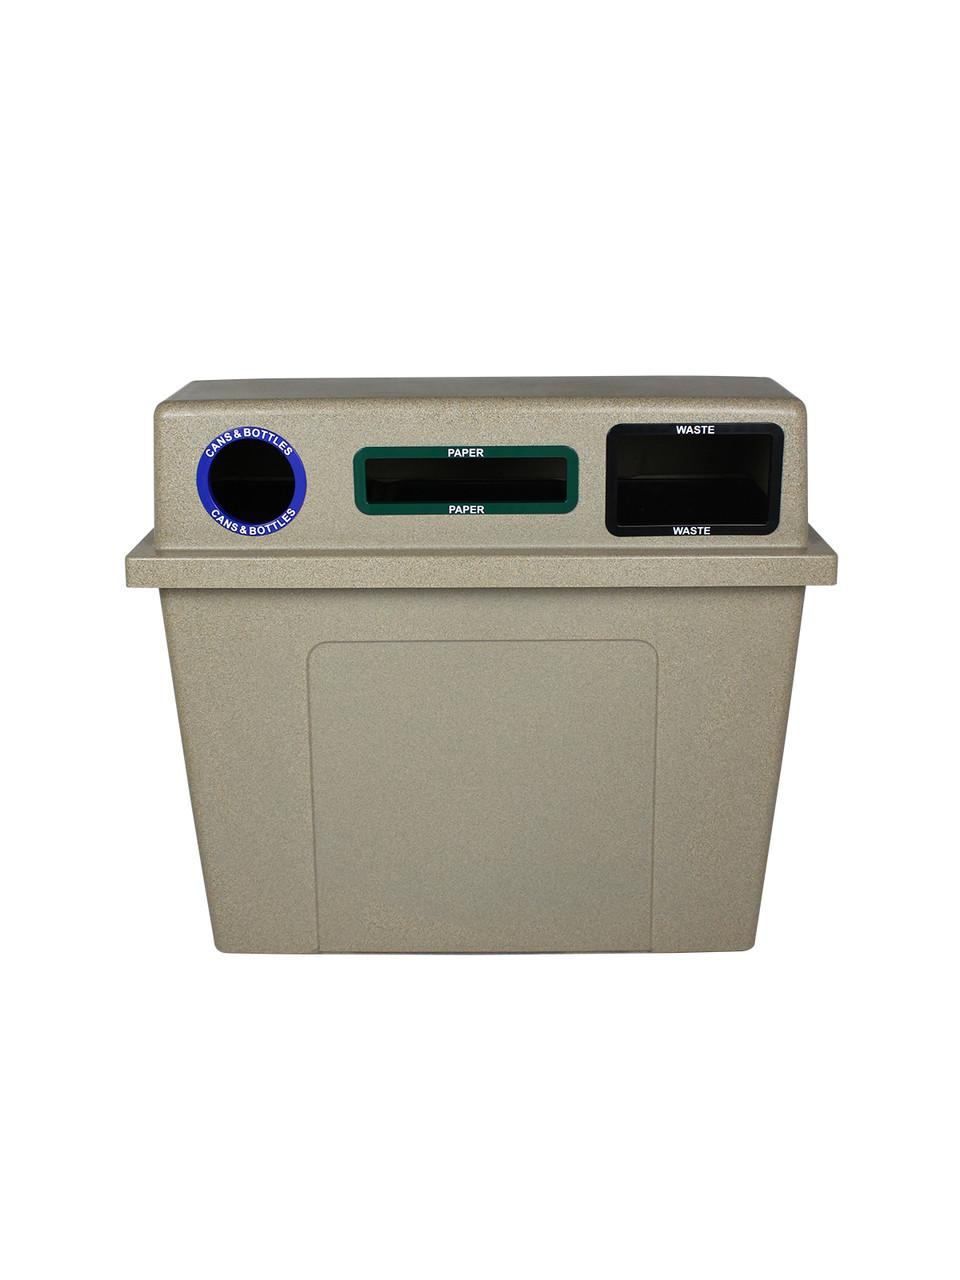 96 Gallon Plastic Dual 3 in 1 Recycling Bin Sandstone 101437 (Circle, Slot, Full)